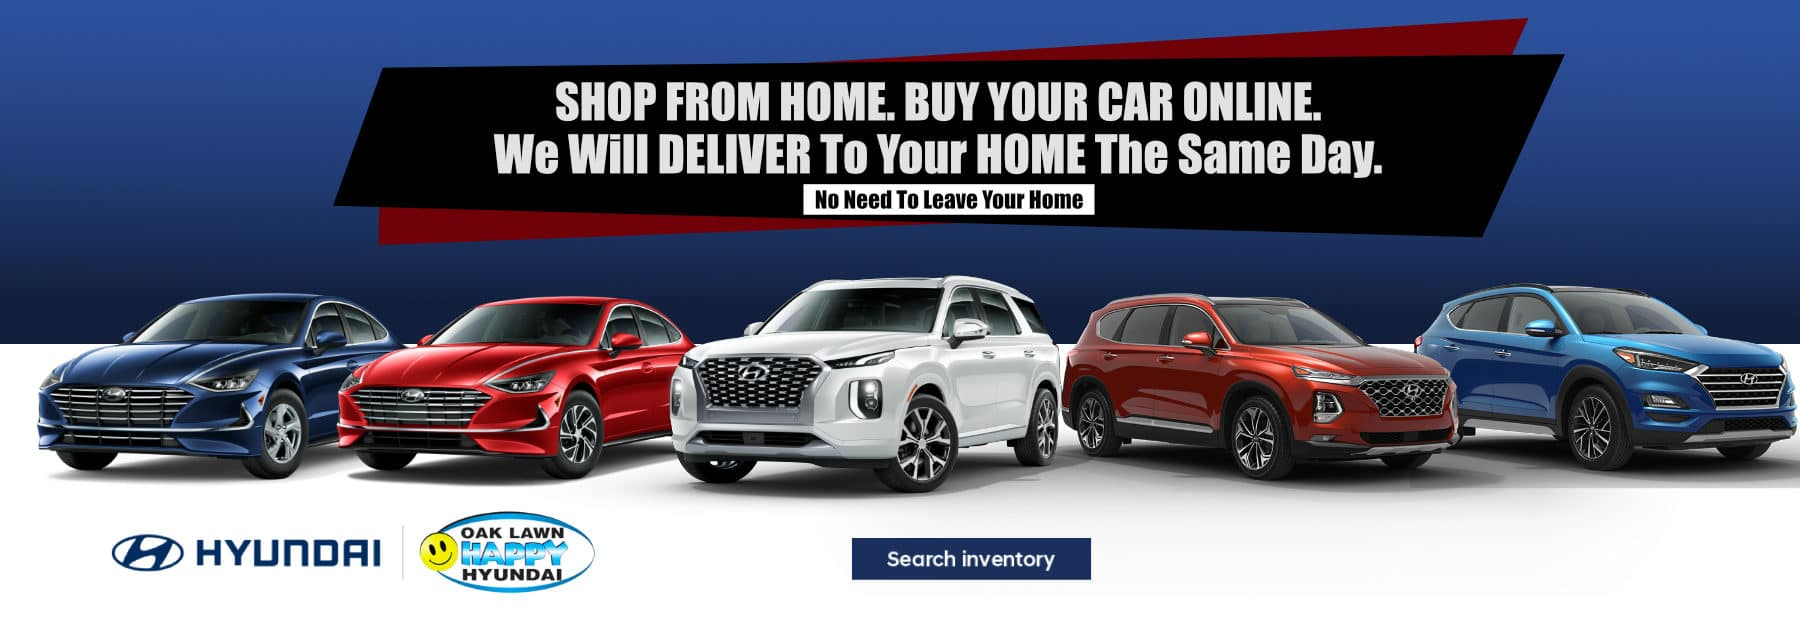 November-2020 Shop From Home_Happy Hyundai